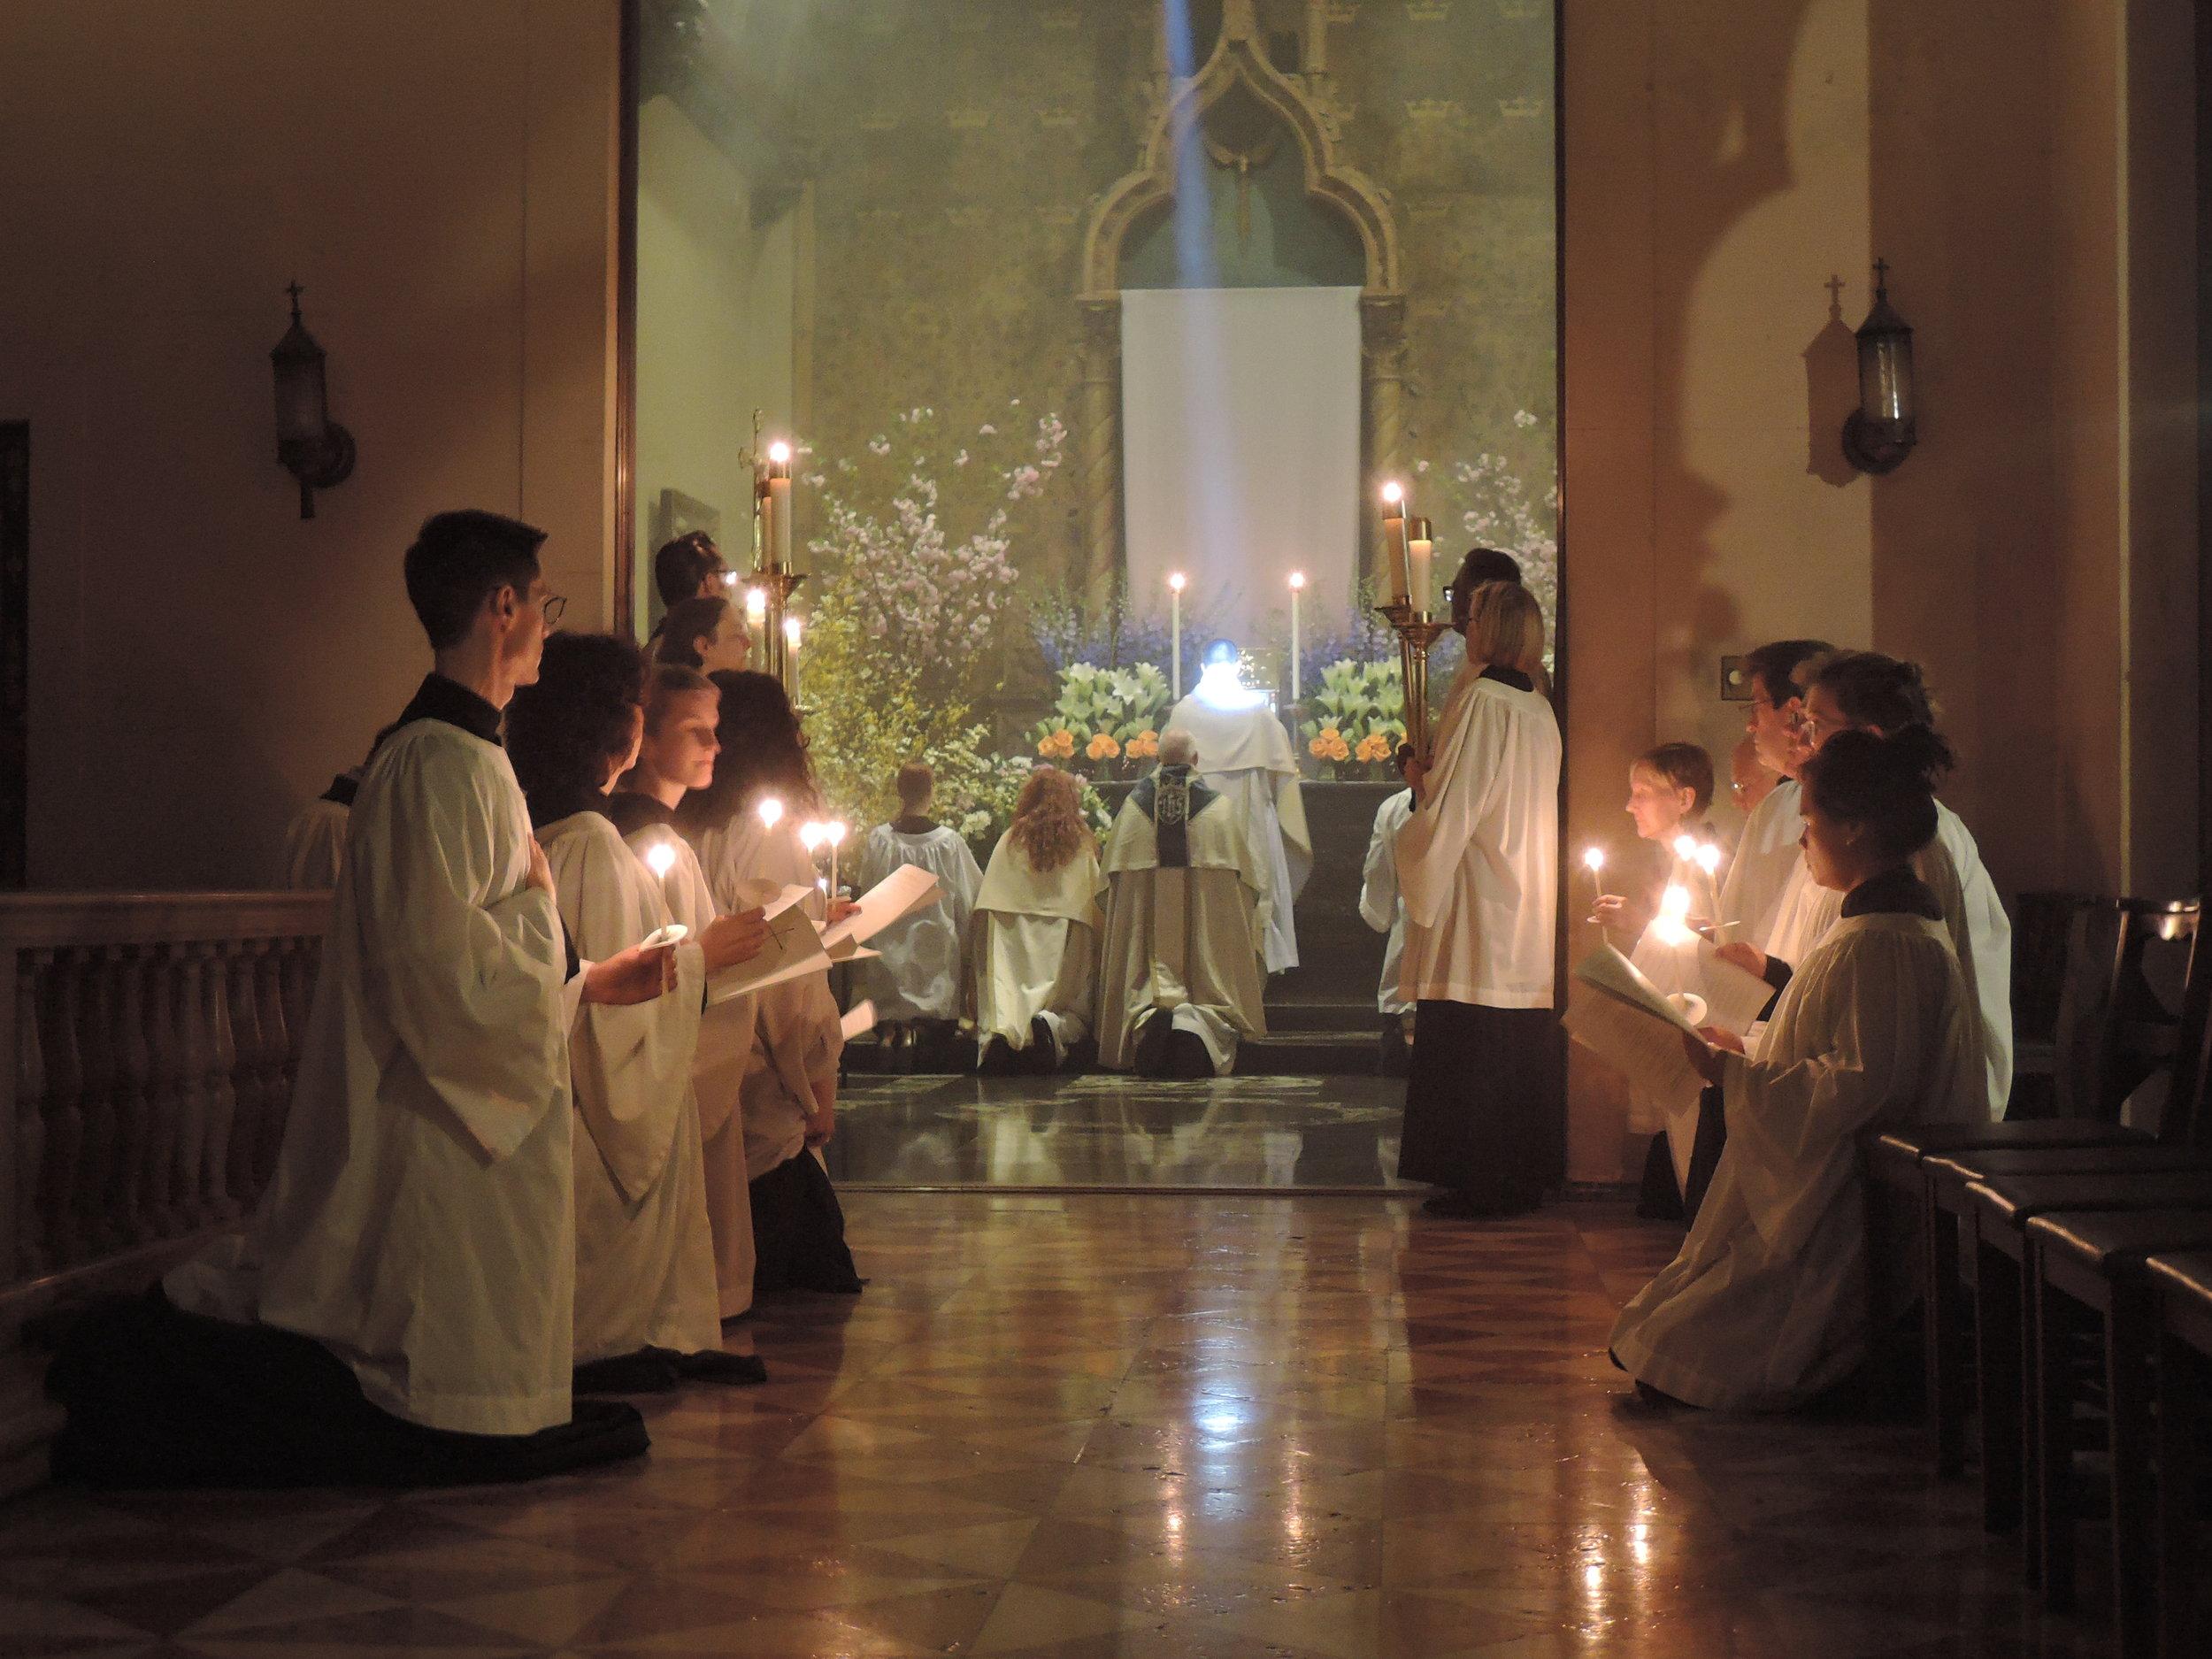 The Saint Mary's Choir at the Altar of Repose on Maundy Thursday